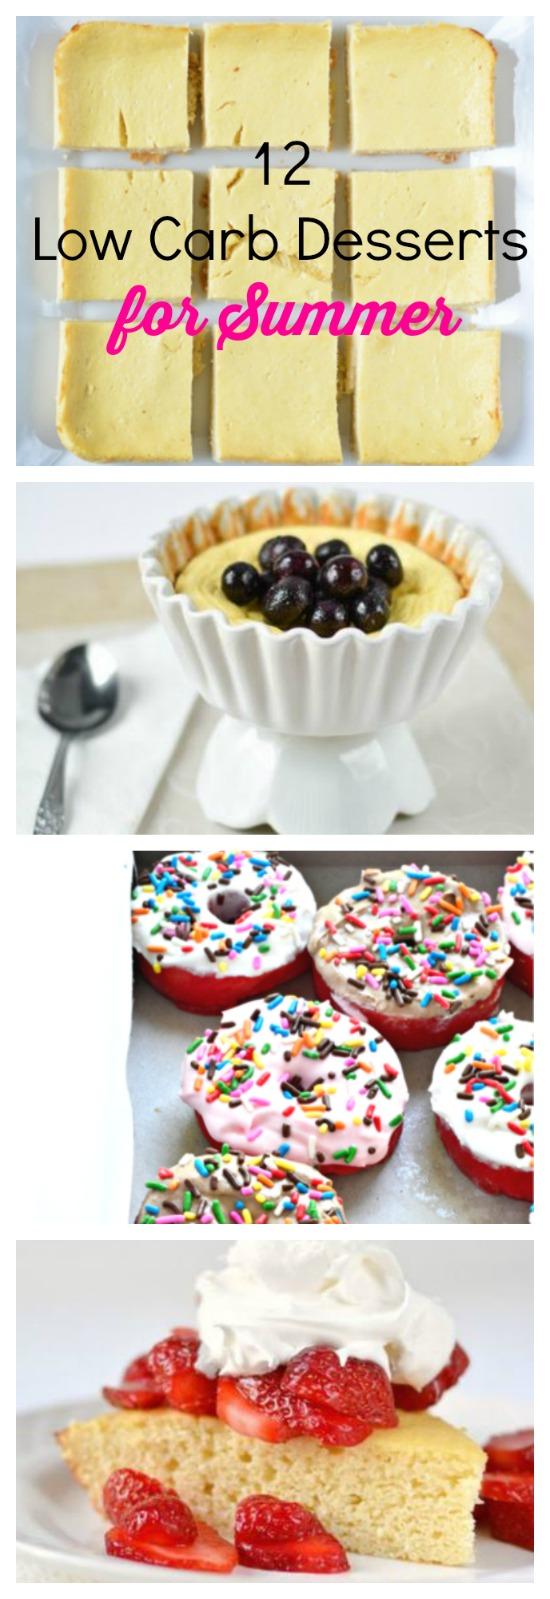 Low-Carb-Desserts